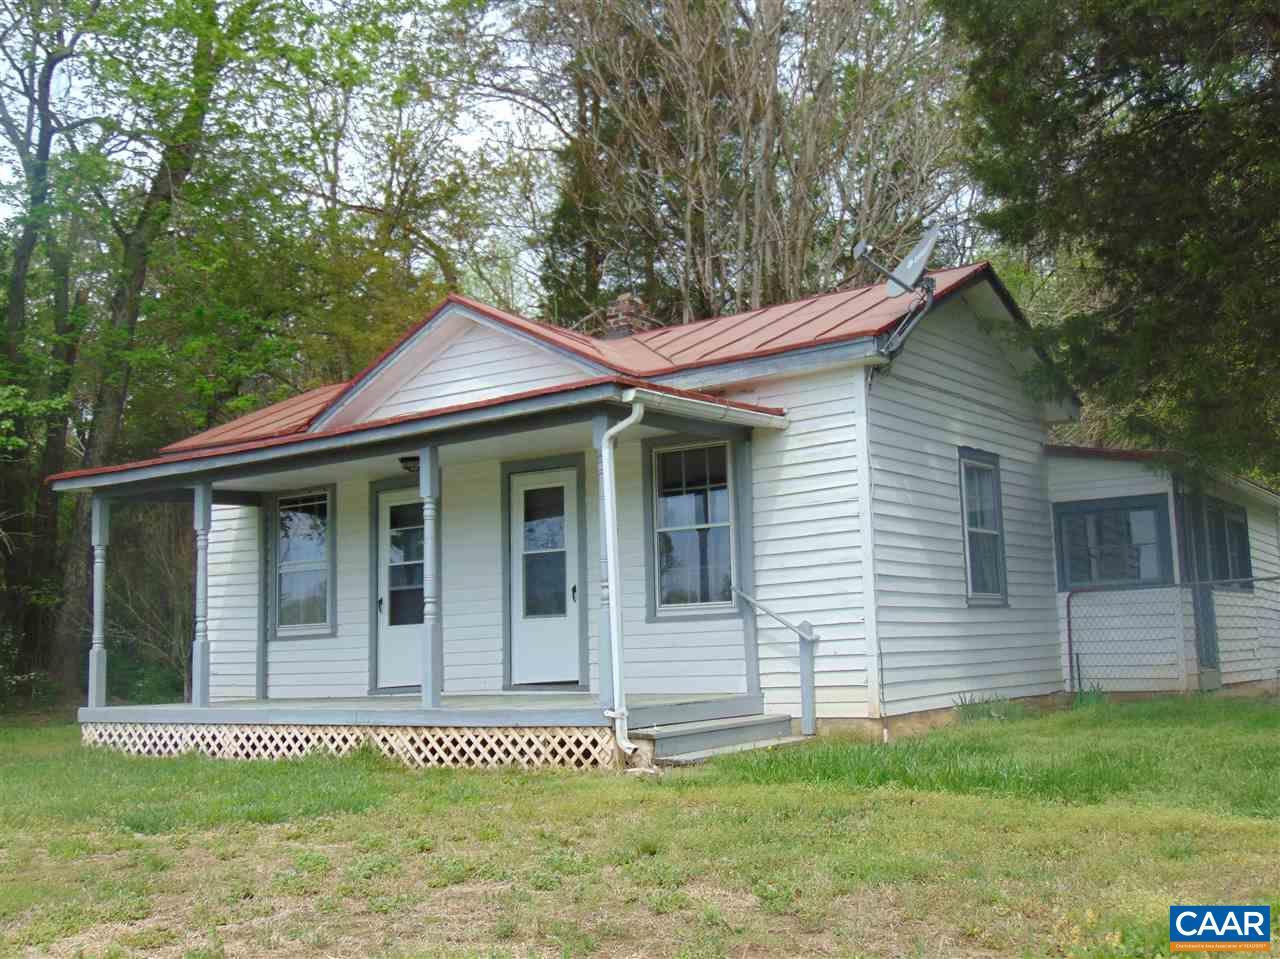 301 BANNISTER TOWN RD, LOUISA, VA 23093